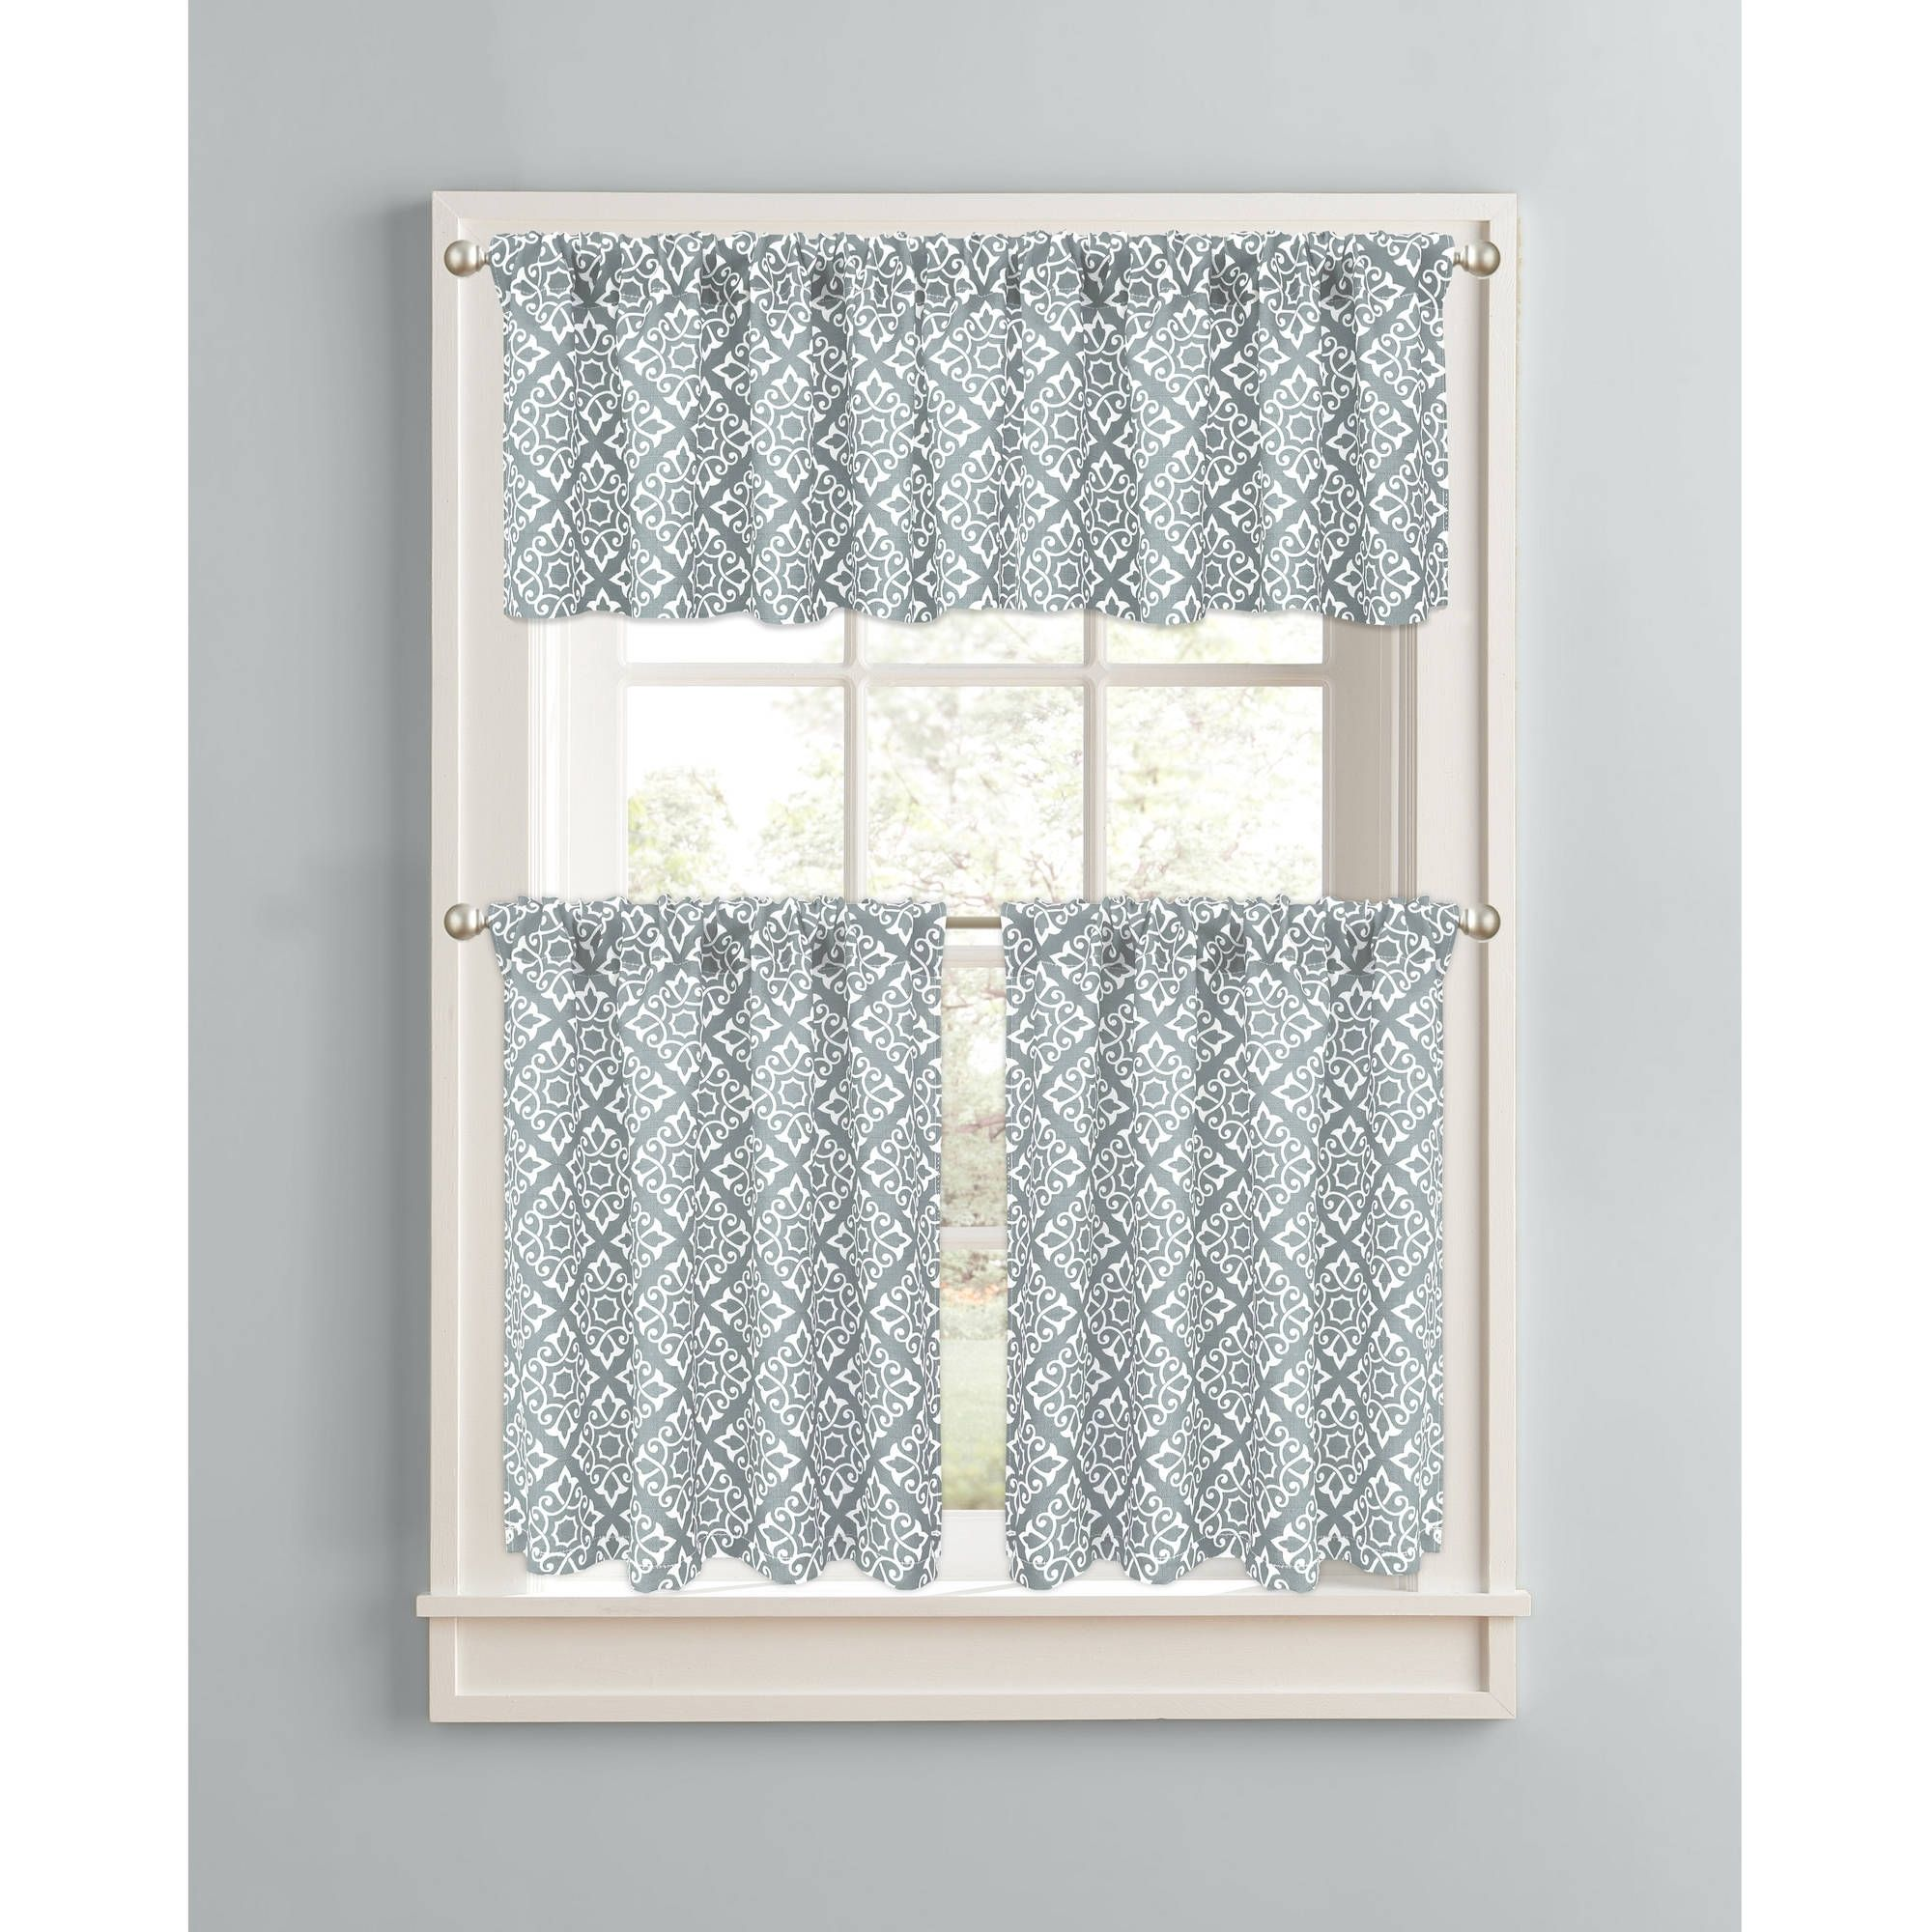 Attractive Aqua And White Kitchen Curtains